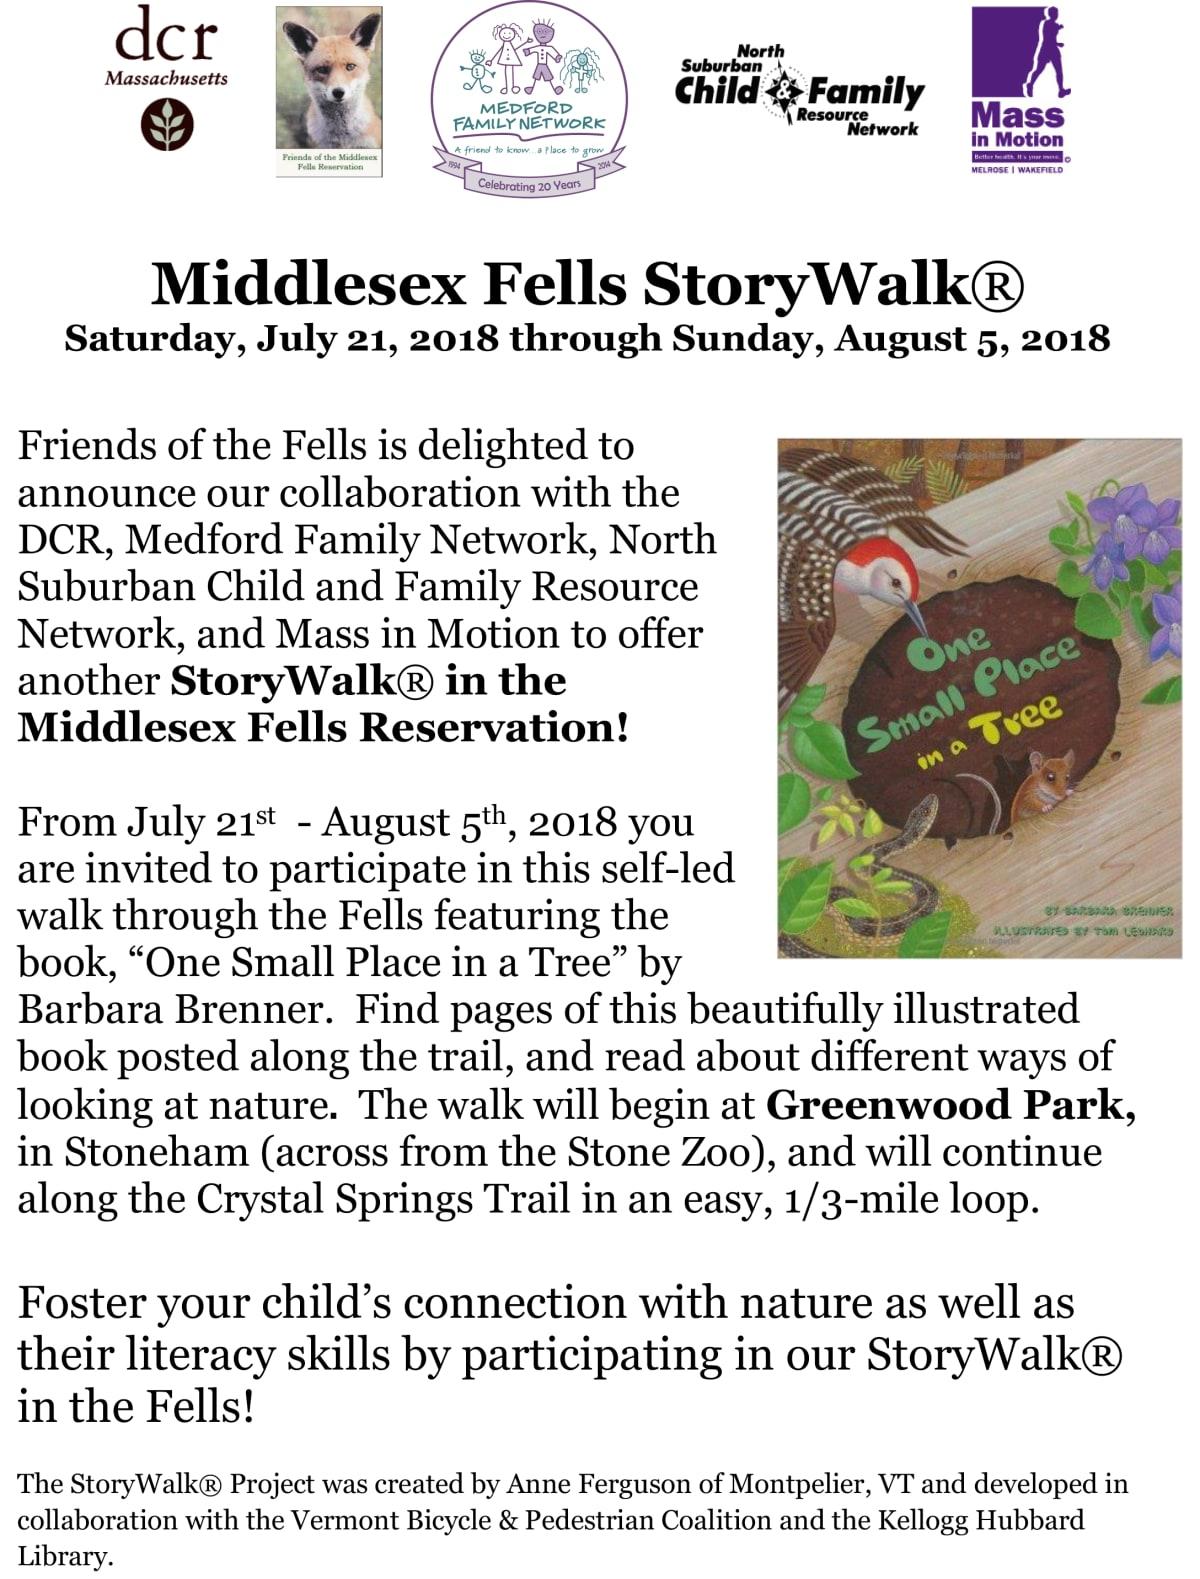 the-2-Middlesex-Fells-Storybook-walk_flyer_July_Aug-2018-w1200.jpg